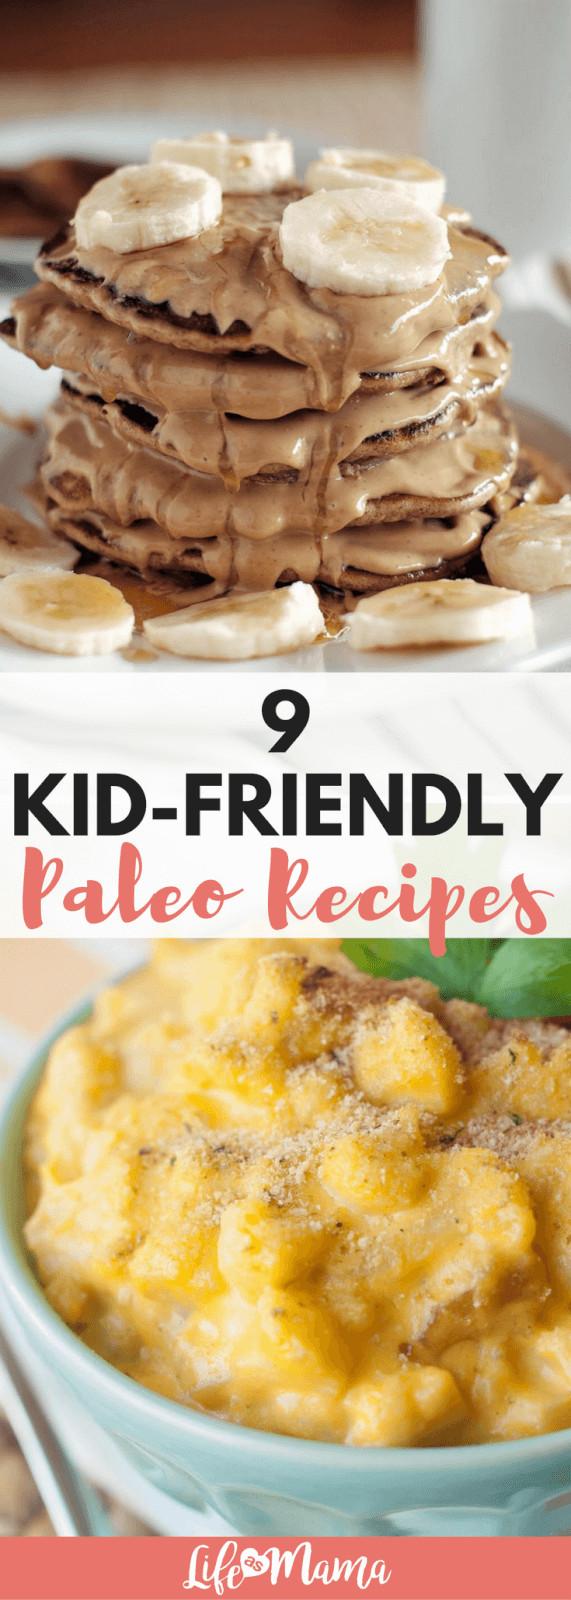 Paleo Recipes For Kids  9 Kid Friendly Paleo Recipes